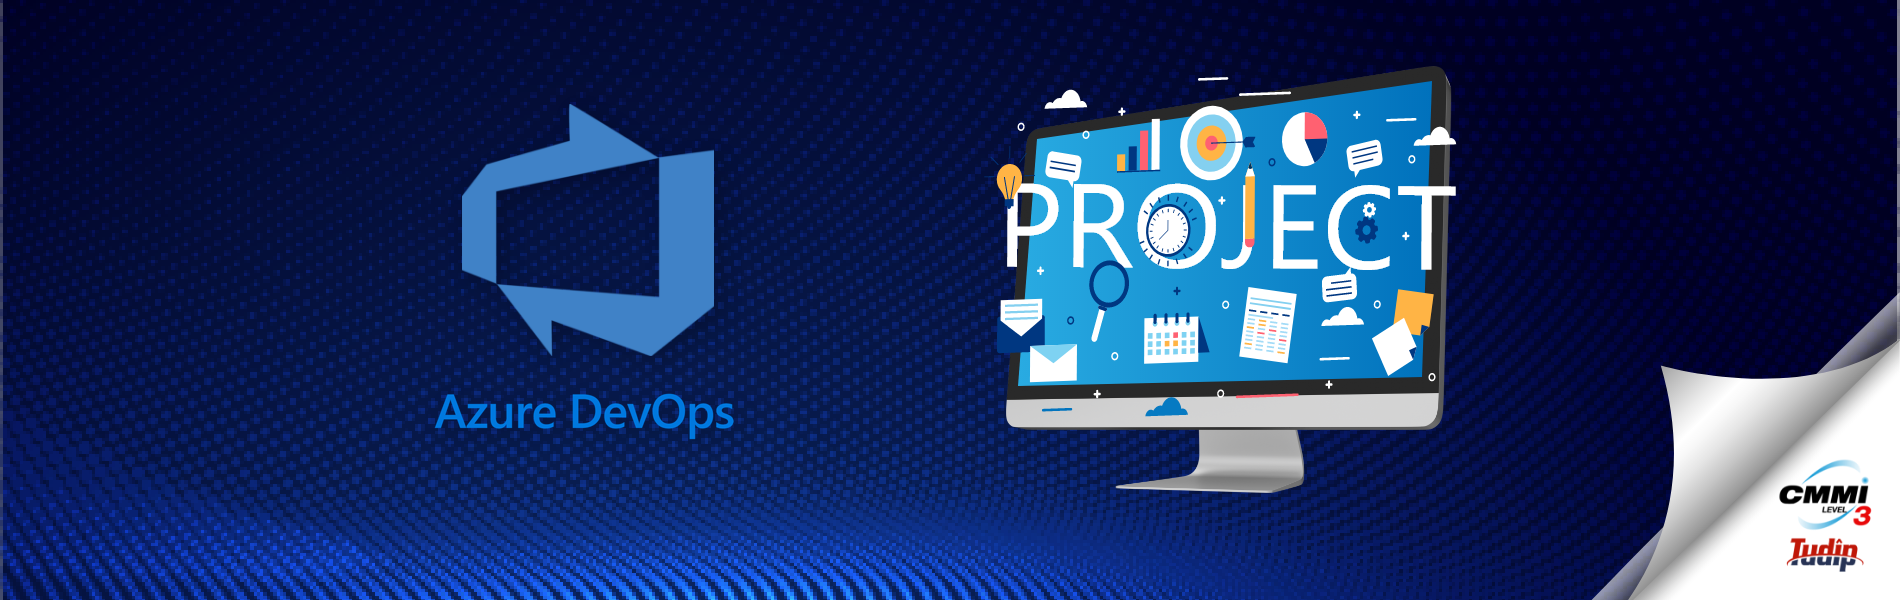 Getting_started_with_Azure_DevOps_website